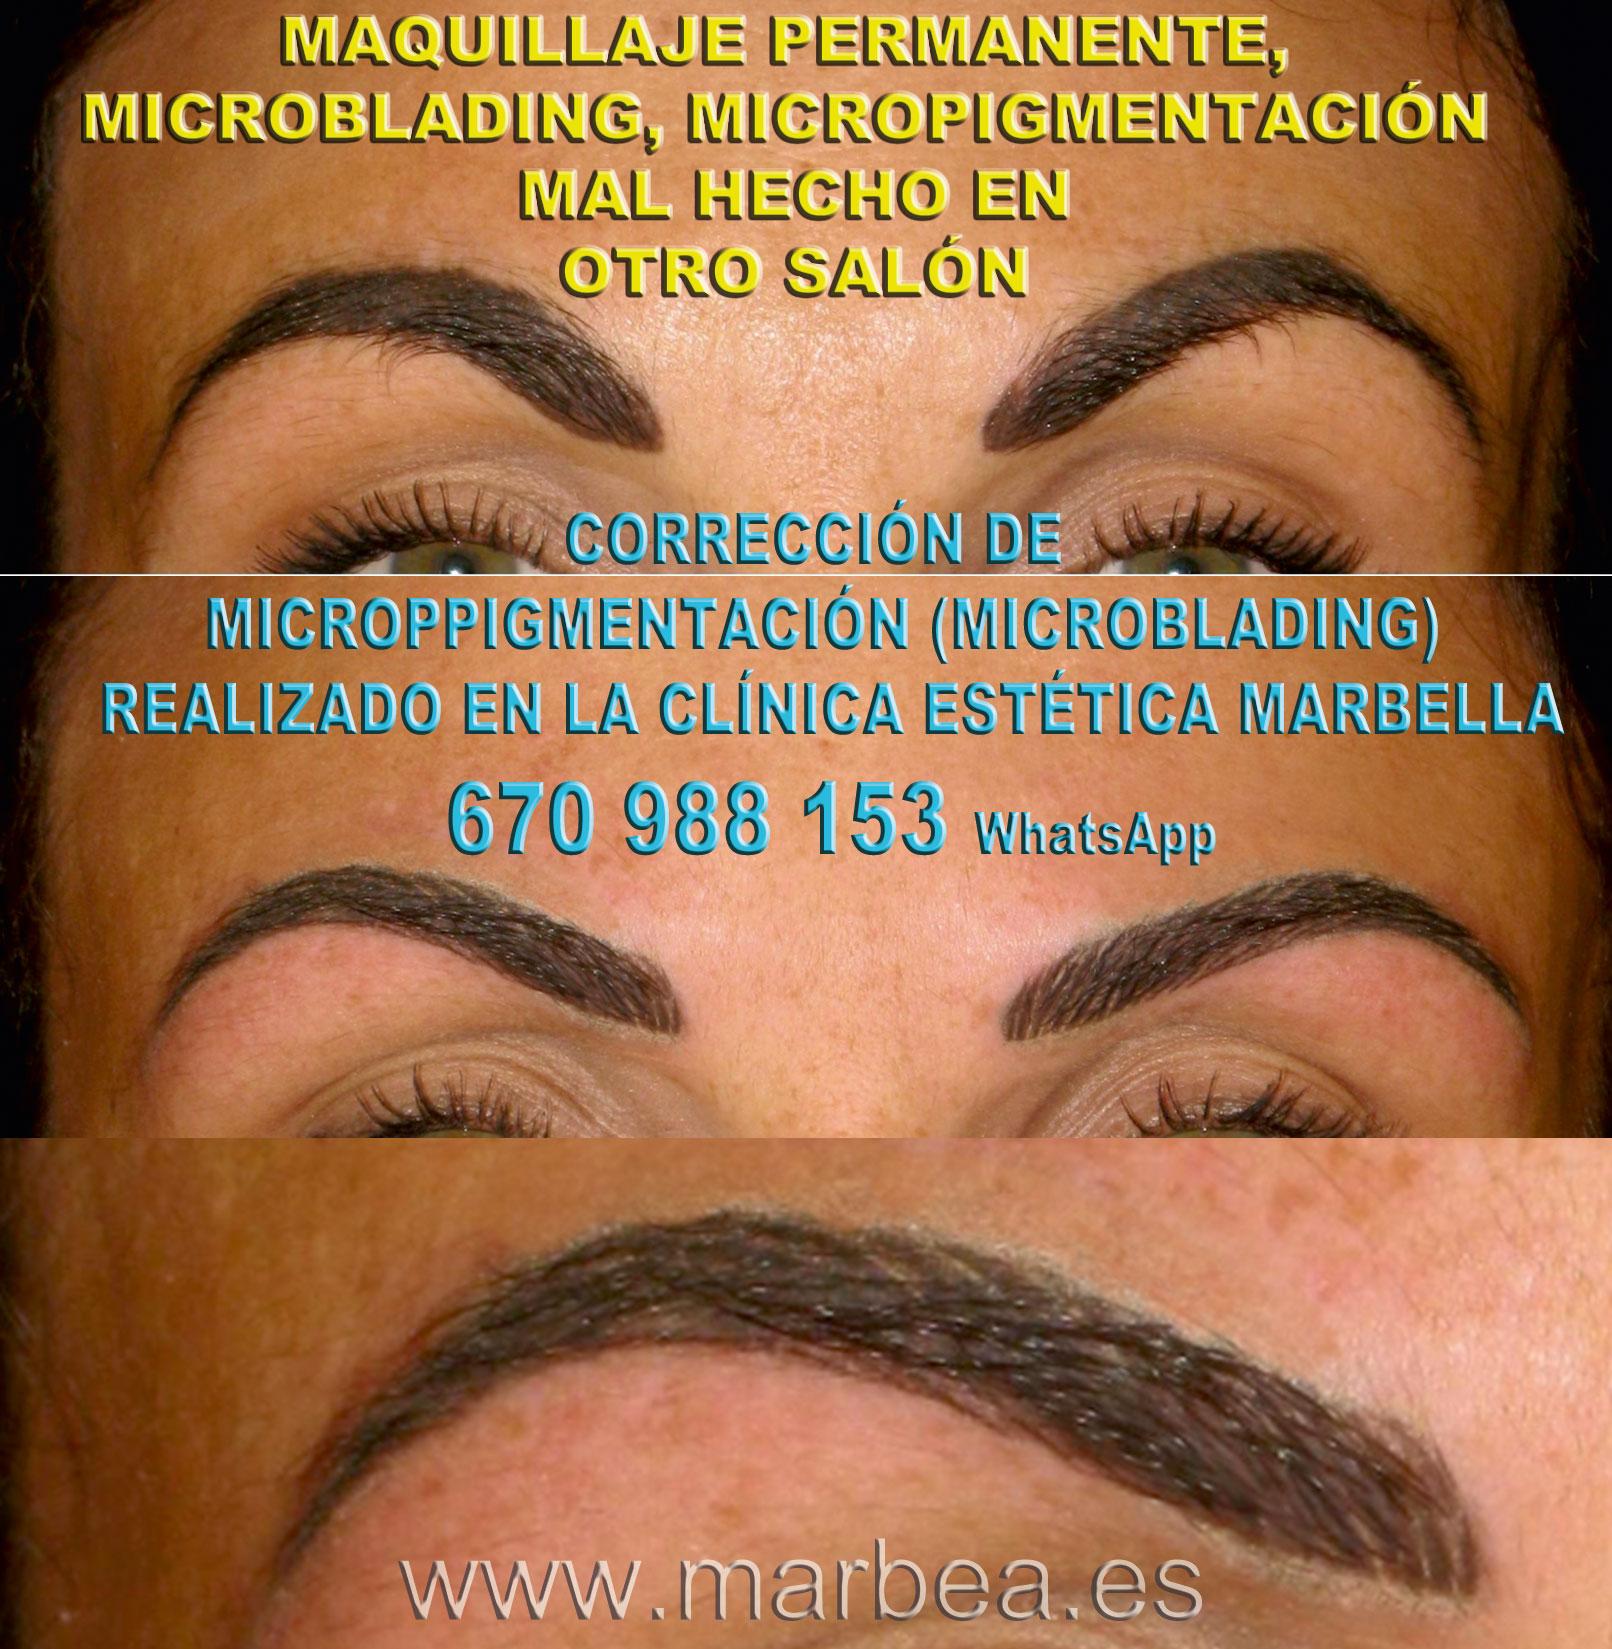 MAQUILLAJE PERMANENTE CEJAS MAL HECHO clínica estética micropigmentación ofrenda corrección de micropigmentación en cejas,micropigmentación correctiva cejas mal hecha